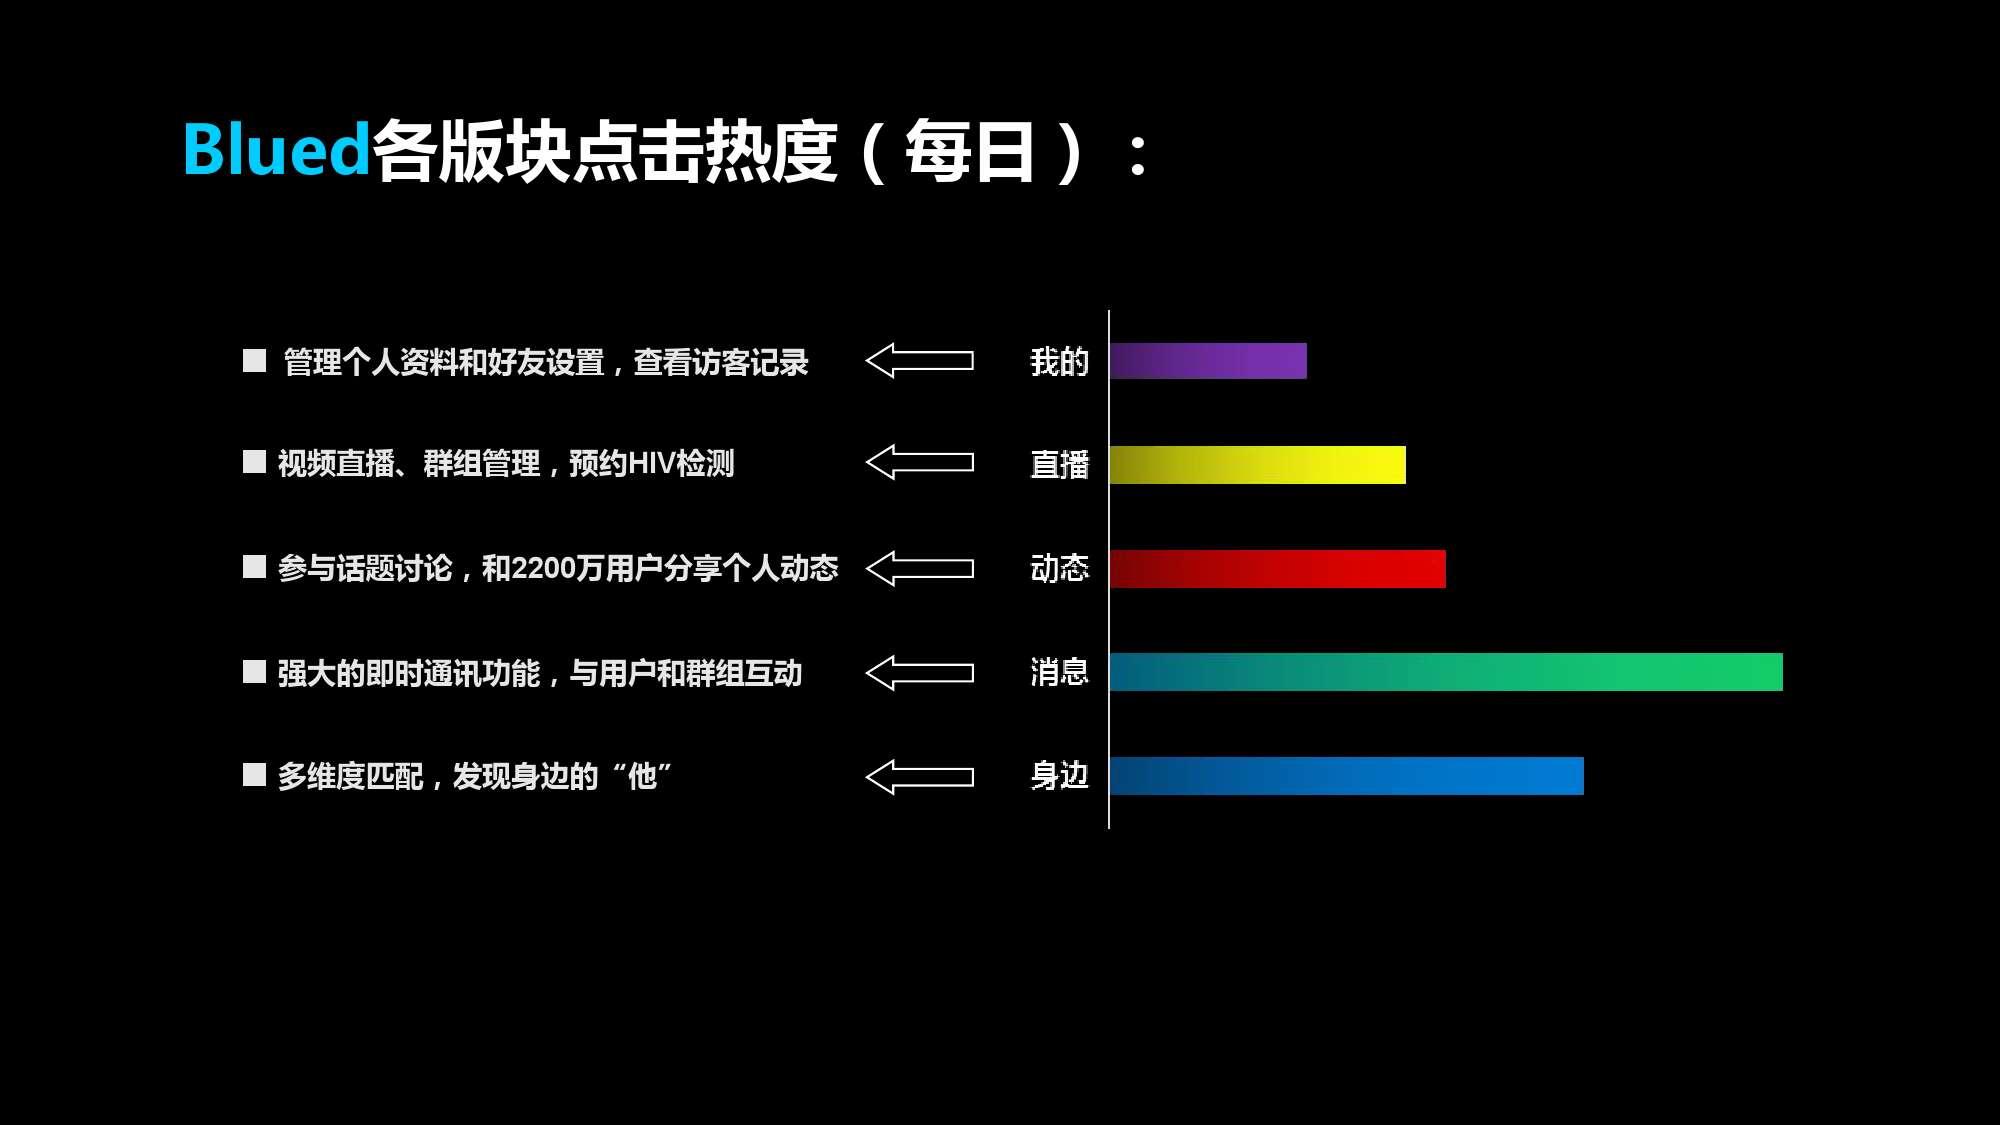 Blued2015中国同志社群大数据白皮书_000021